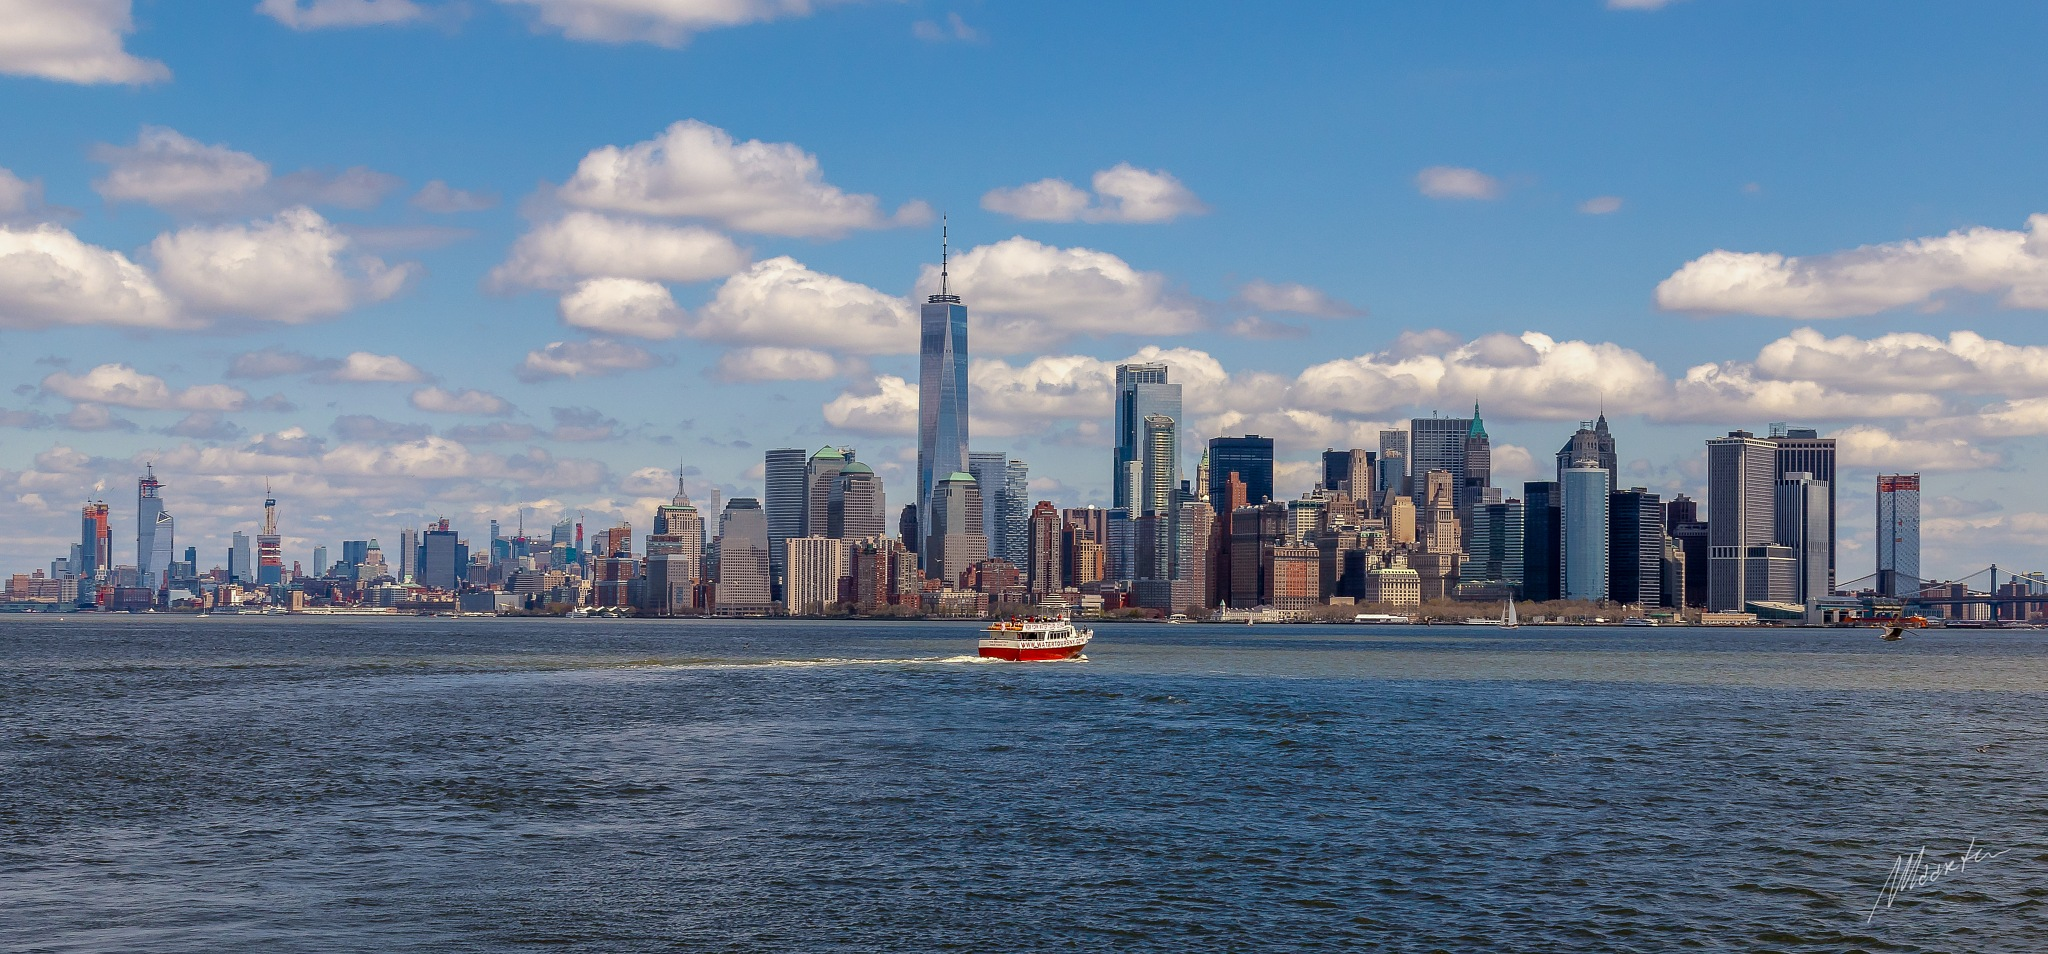 New York  by Maarten Hendriks